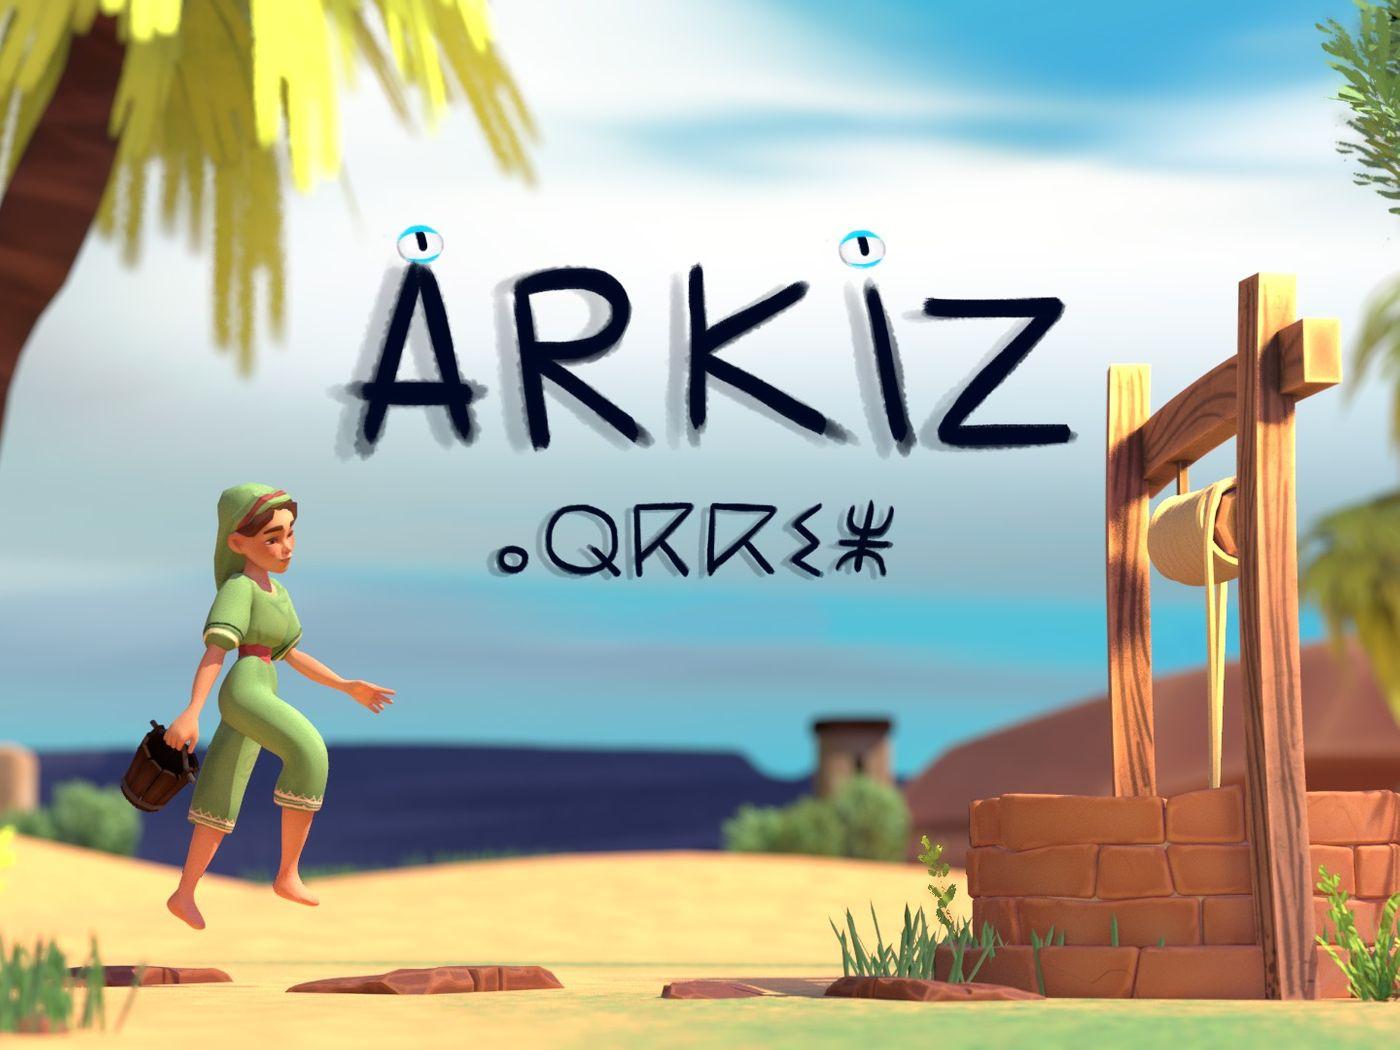 Arkiz - A short film by Aya Aboudi